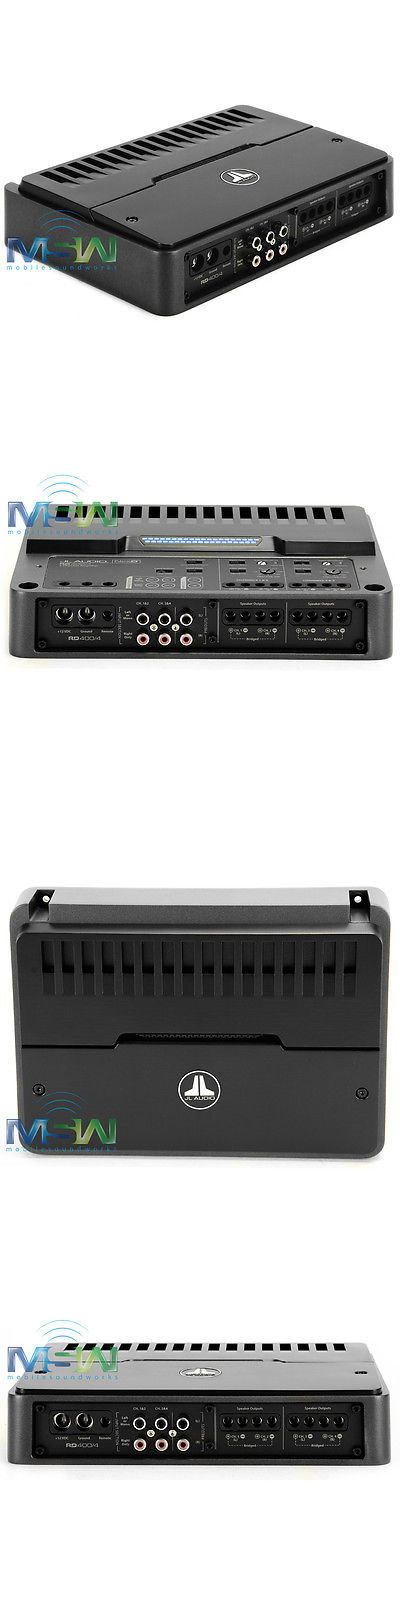 Car Amplifiers: *New* Jl Audio Rd400/4 Rd Series Nexd™ 4 Channel Class D Car Audio Amplifier -> BUY IT NOW ONLY: $299.95 on eBay!